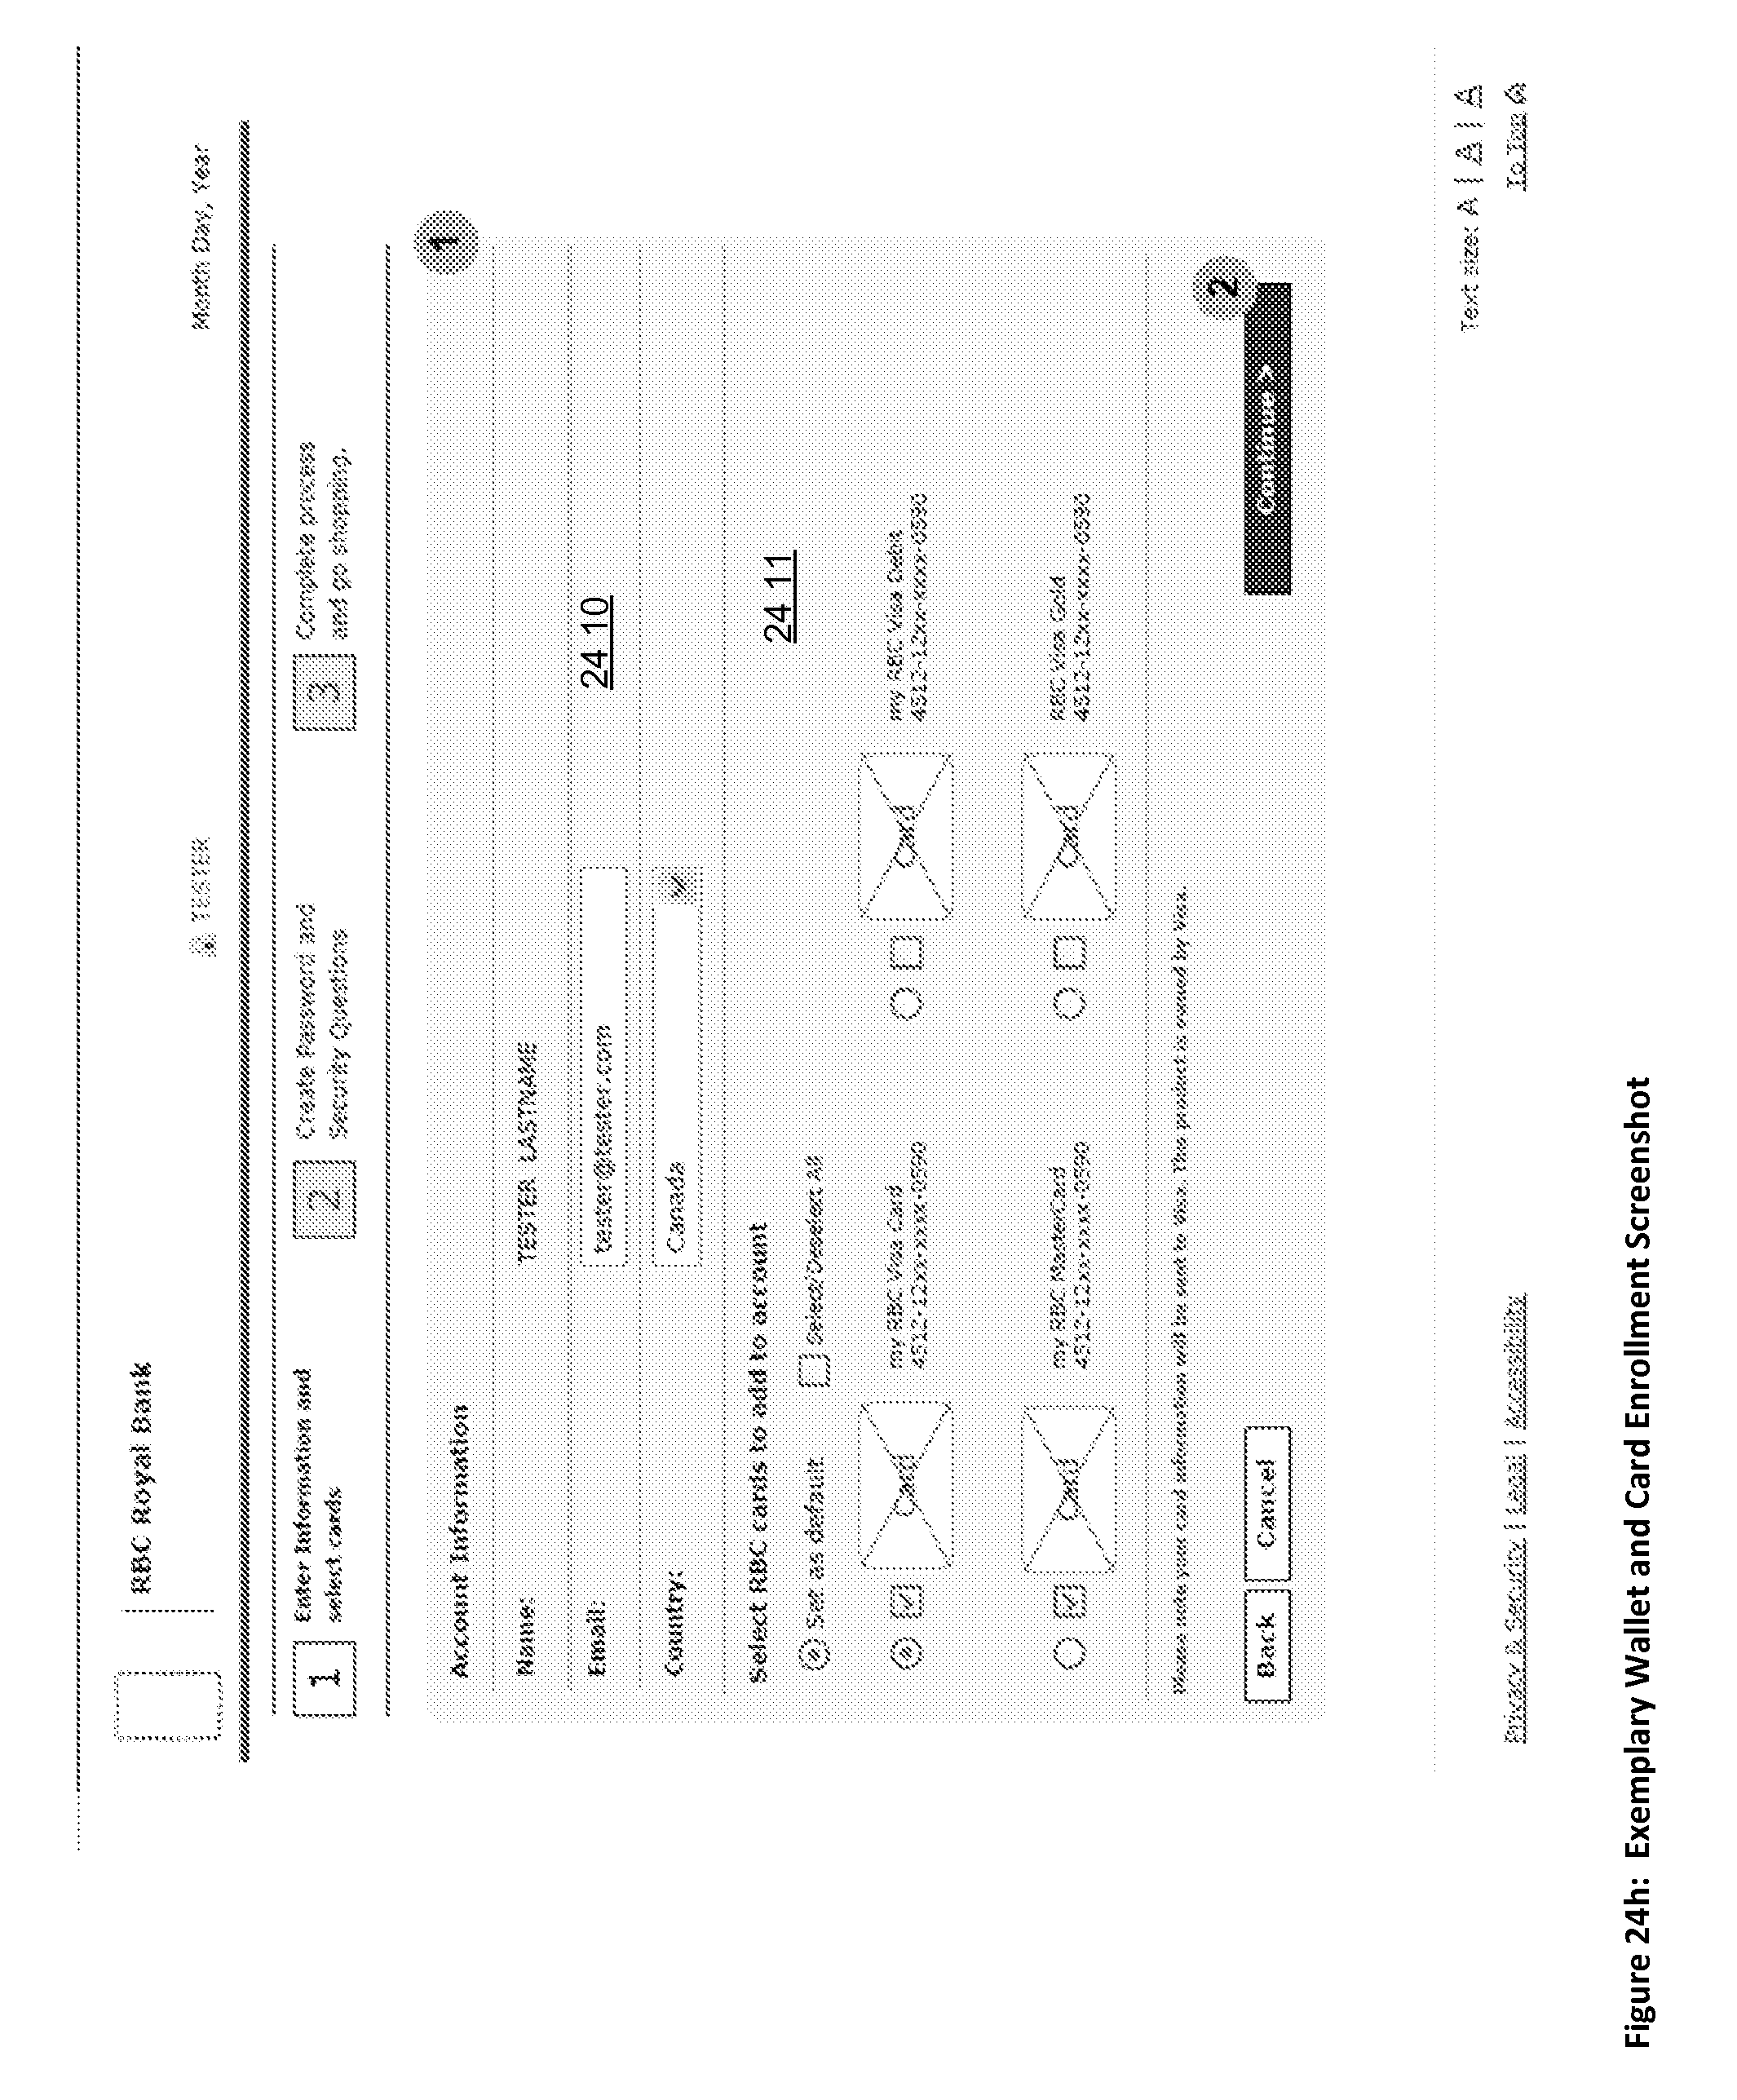 Interactive Cryptogram Solver